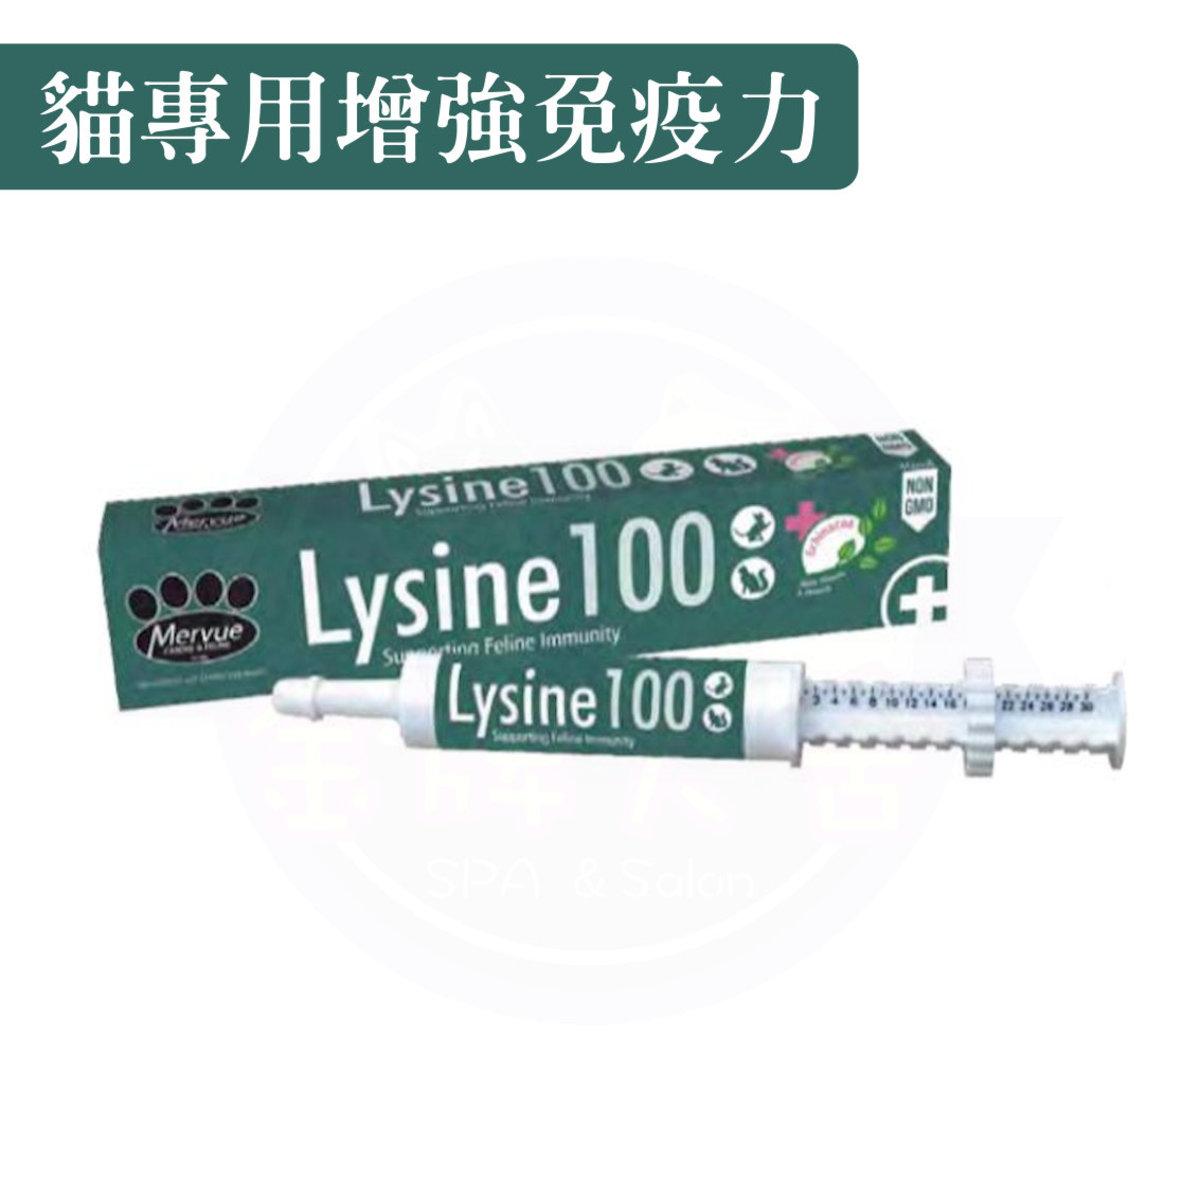 Lysine 100- for cats to enhance immunity 30ML